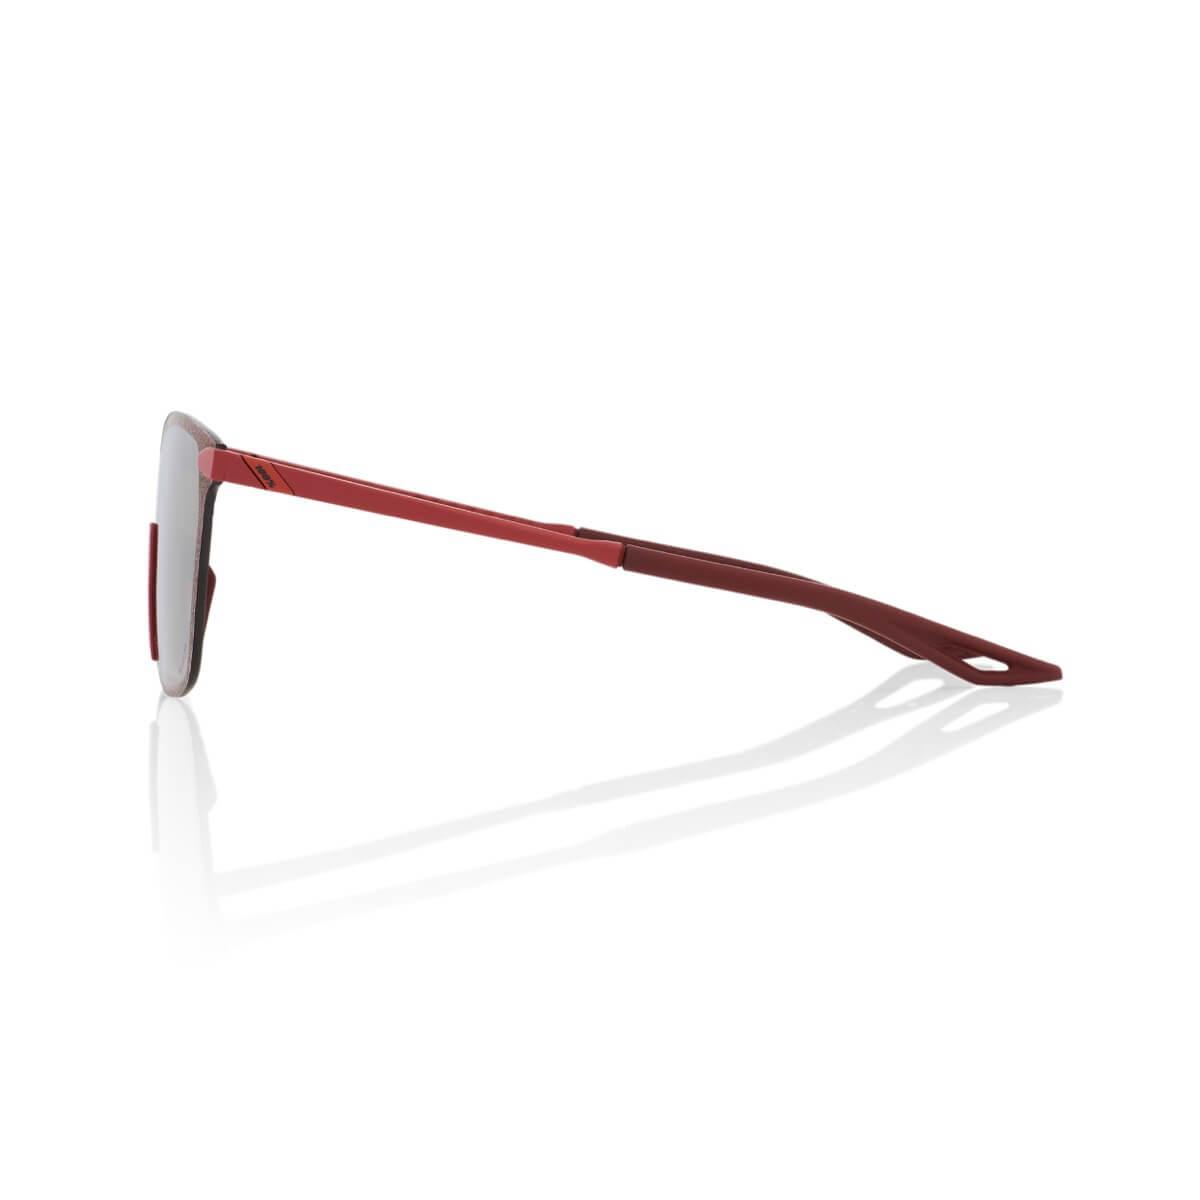 LEGERE Square – Soft Tact Crimson – HiPER Silver Mirror Lens